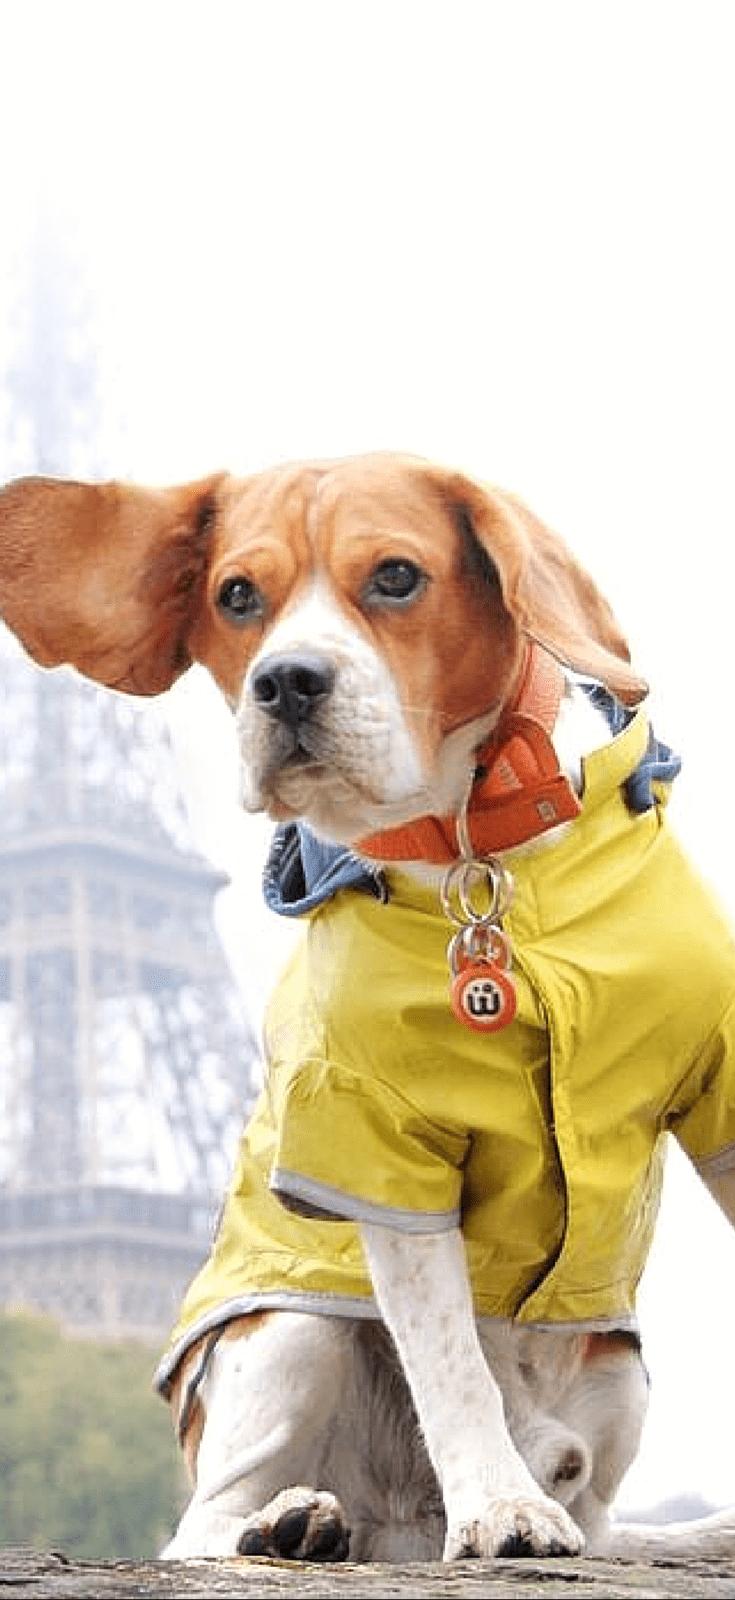 Beagle Love from Paris :)